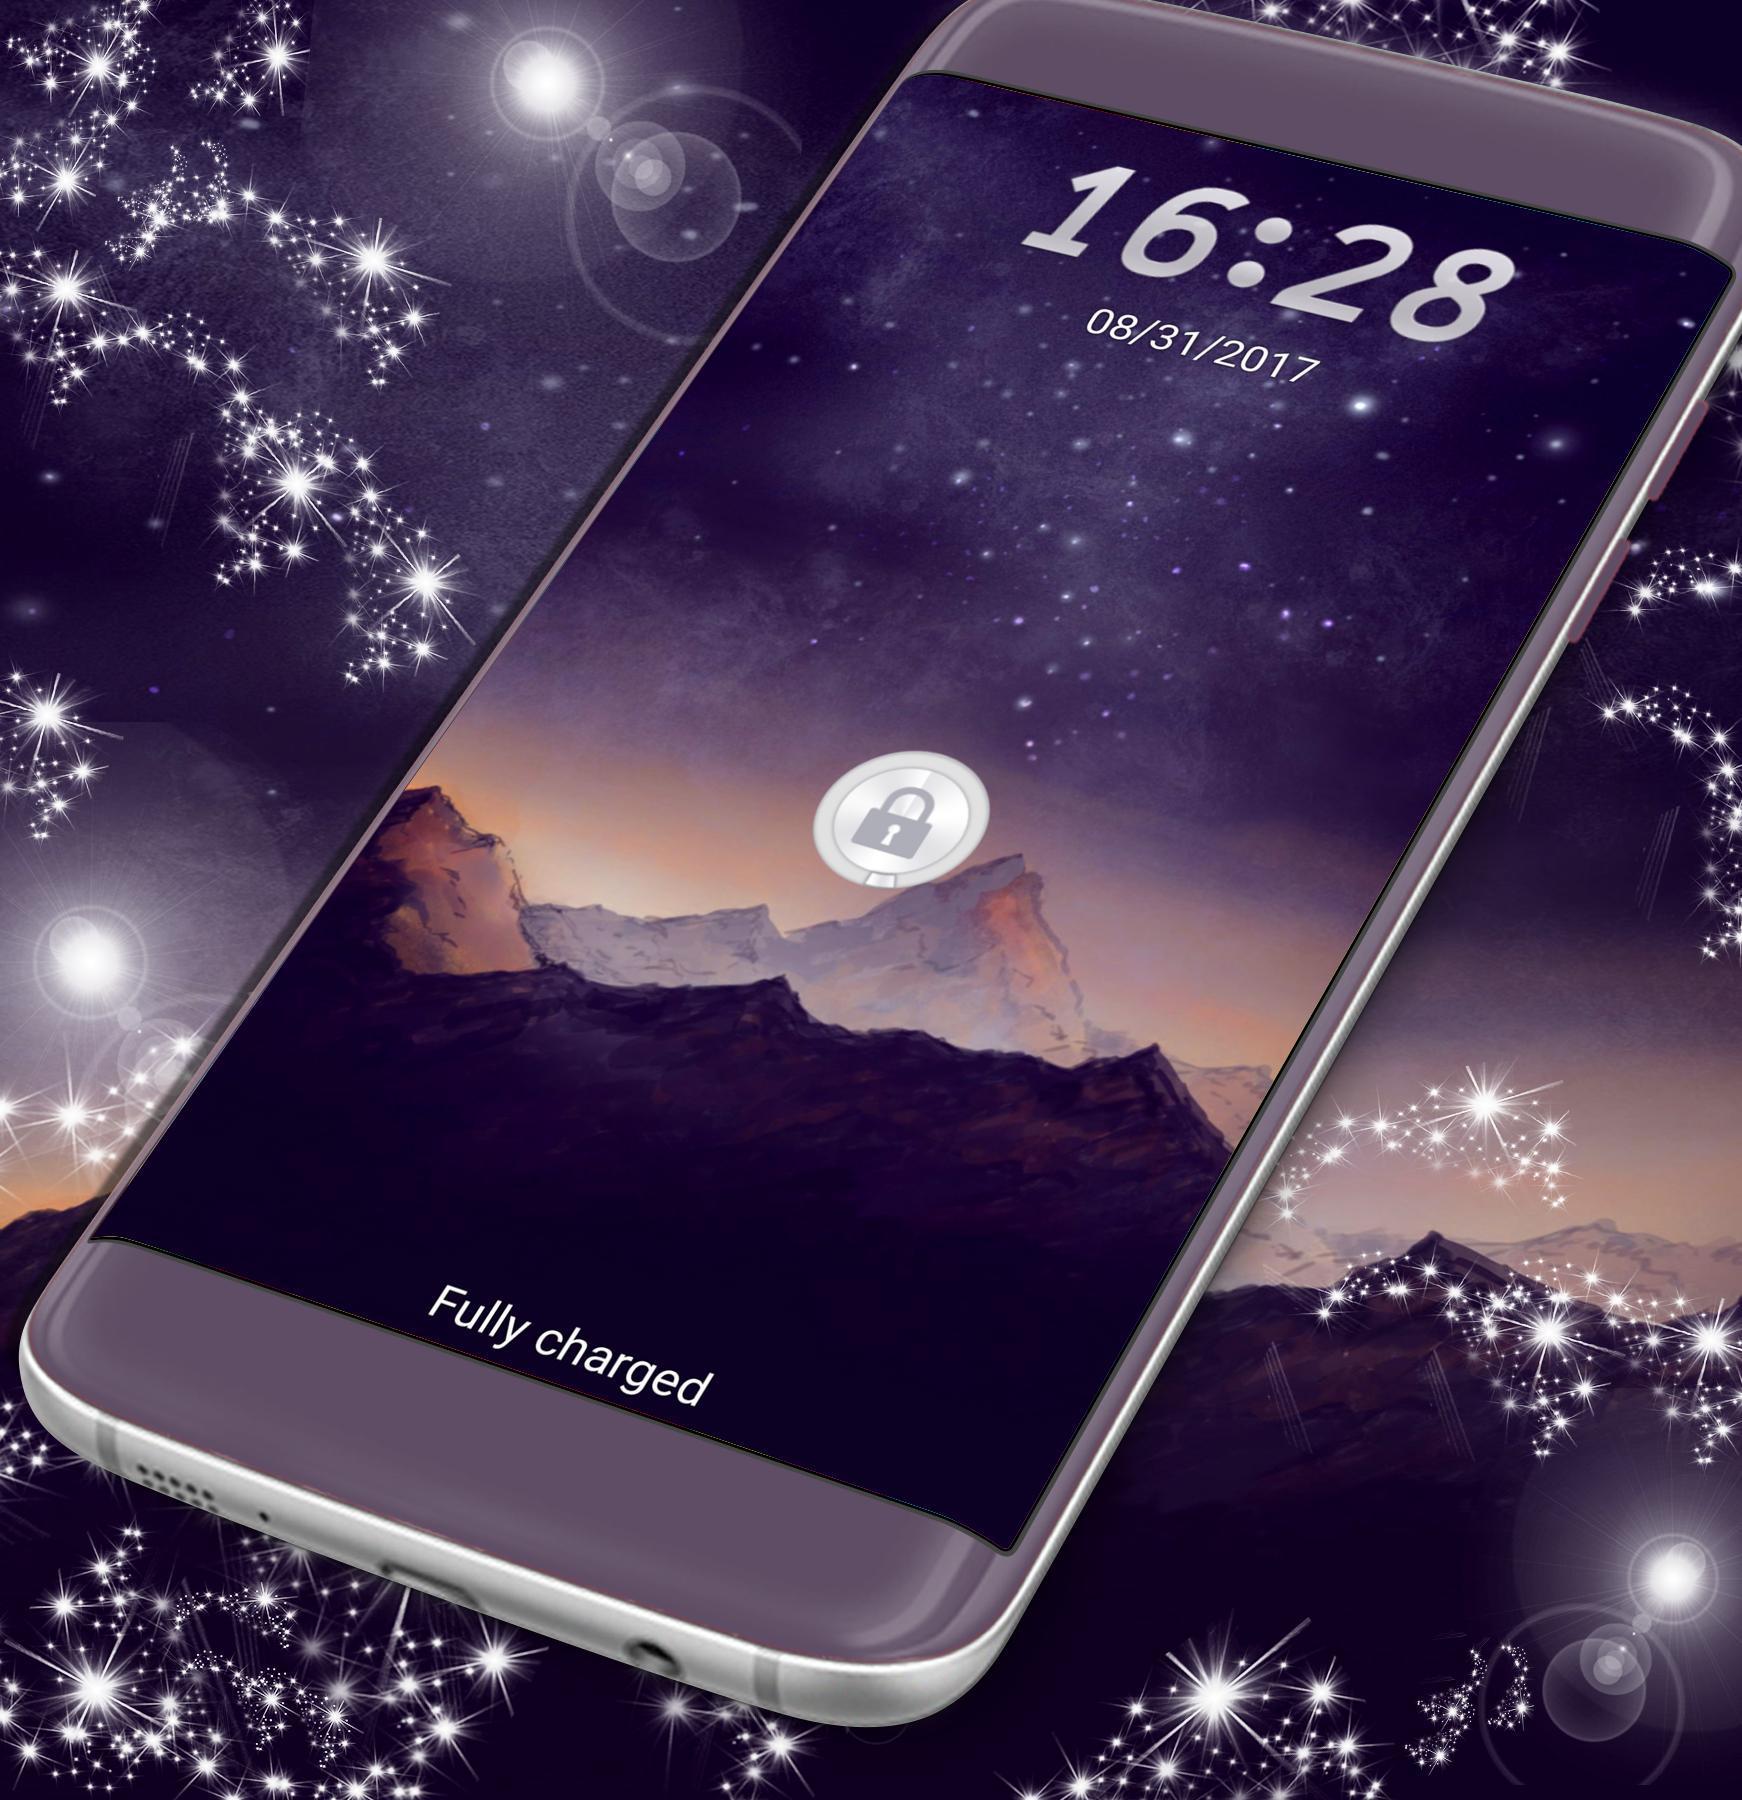 Night Landscape Locker Theme For J5 Prime For Android Apk Download